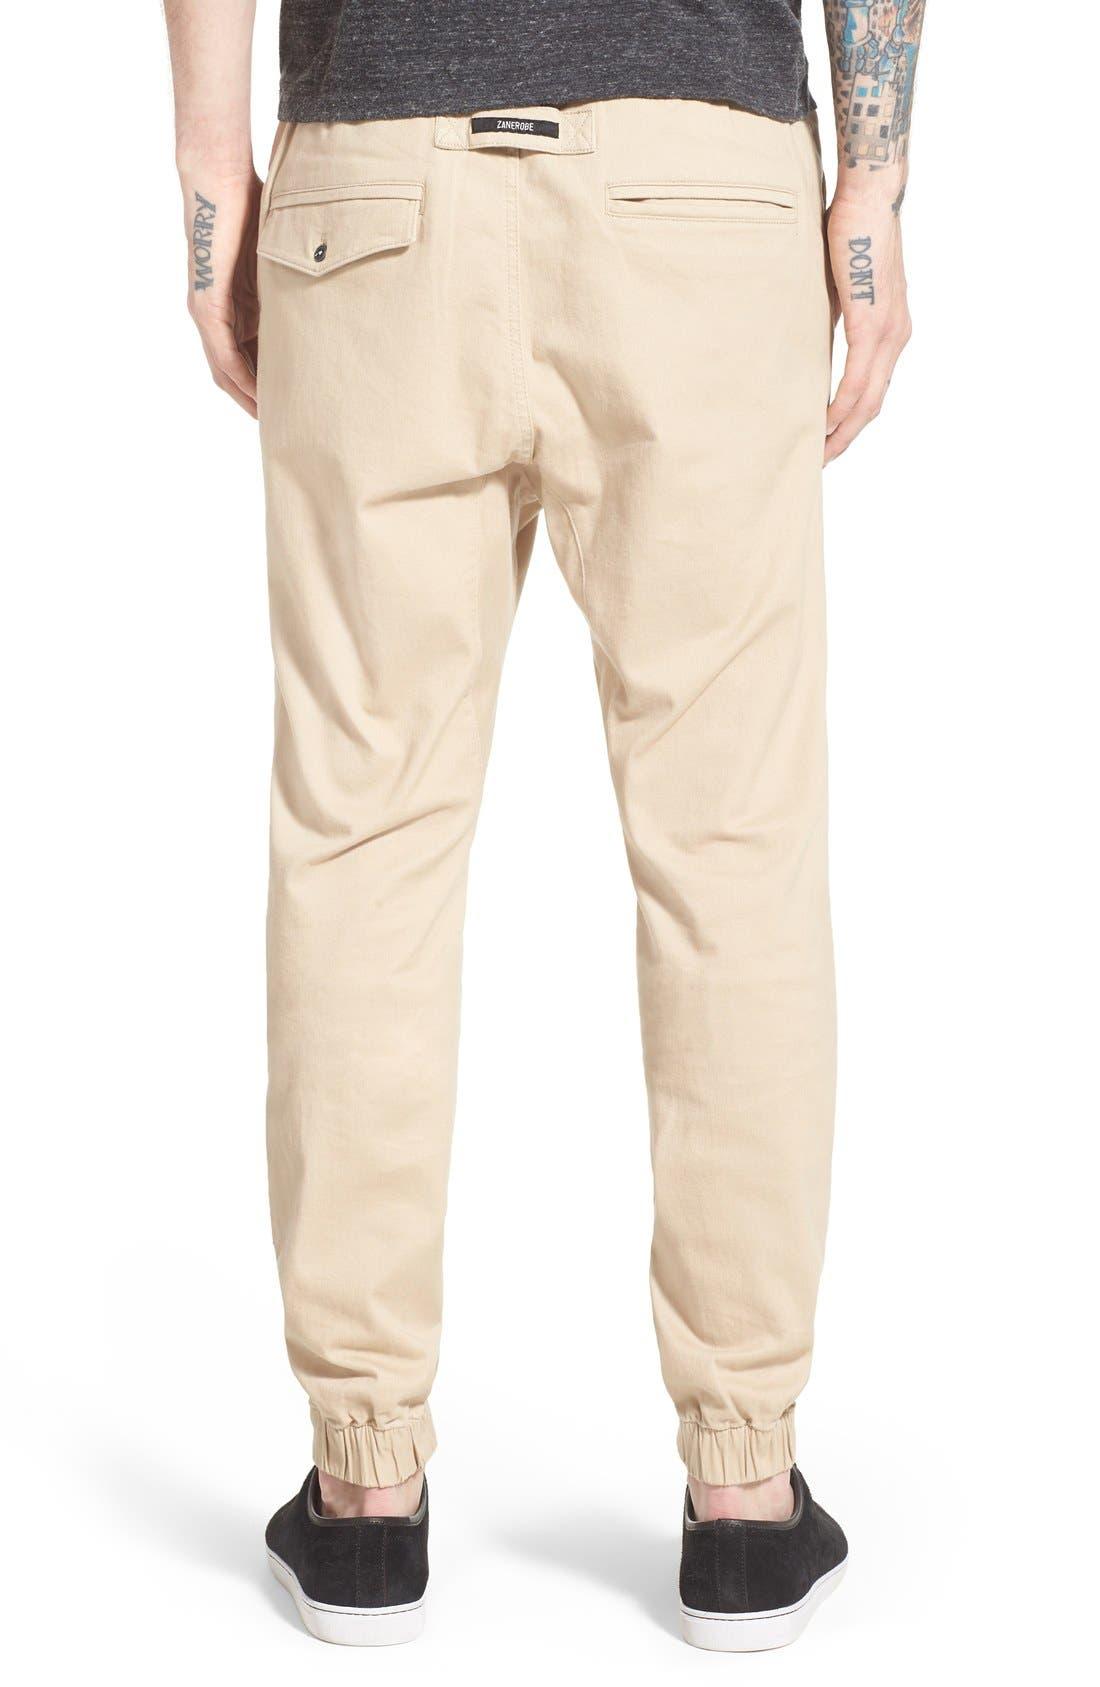 'Sureshot' Jogger Pants,                             Alternate thumbnail 2, color,                             281